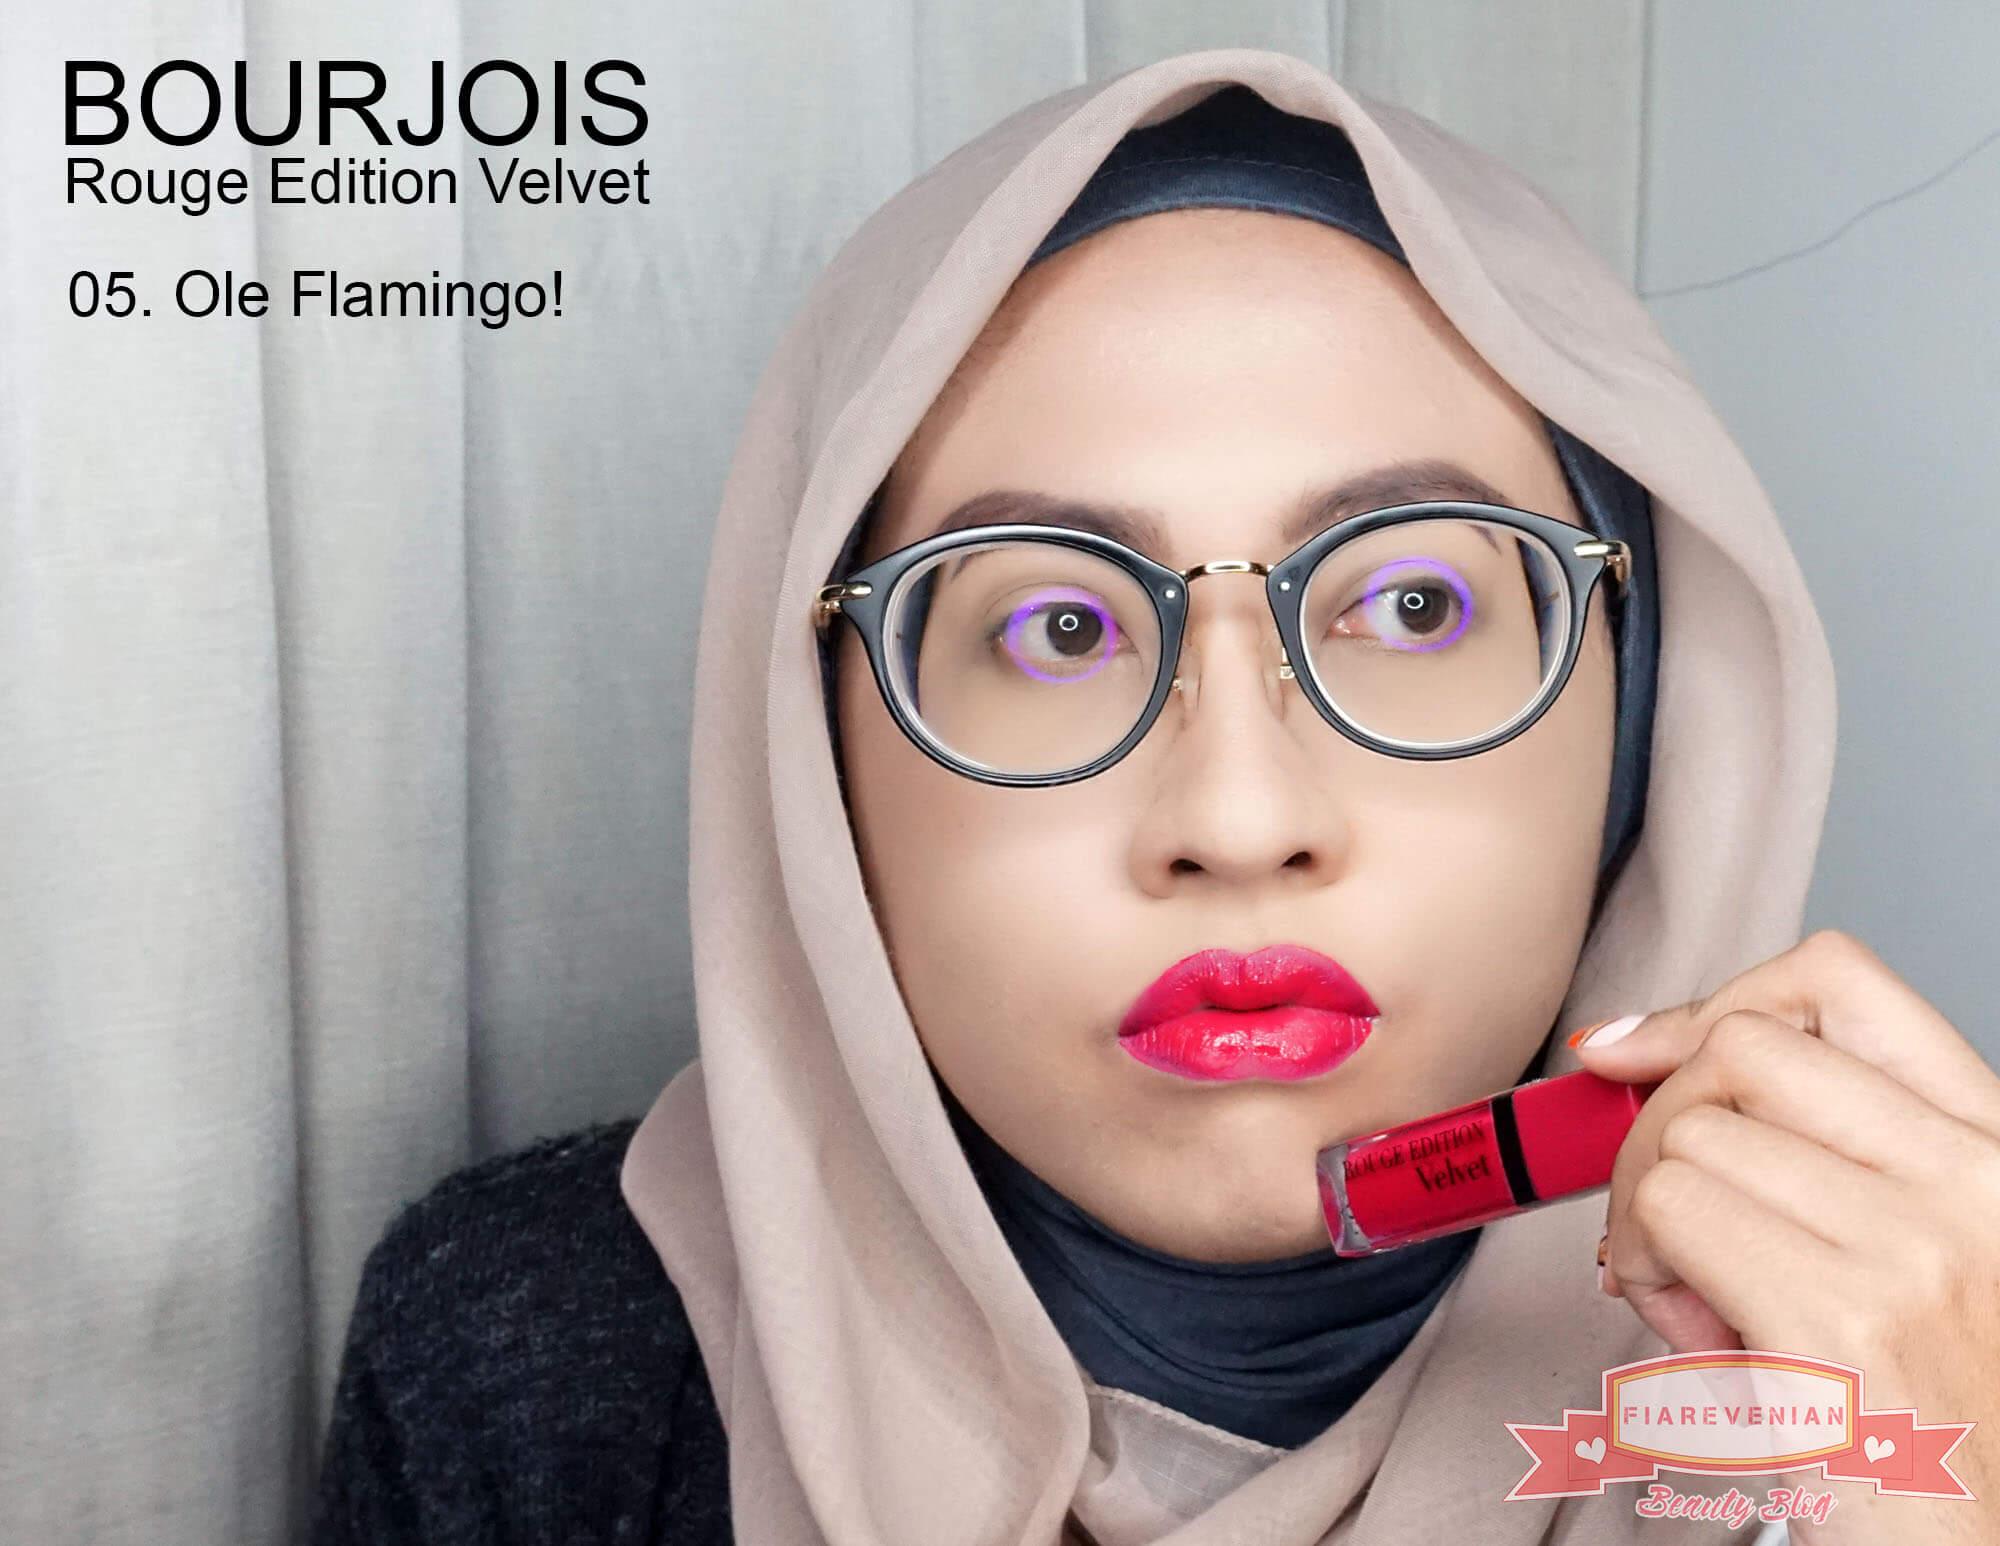 Bourjois_Rouge_Edition_Velvet_ 05._Ole_Flamingo!